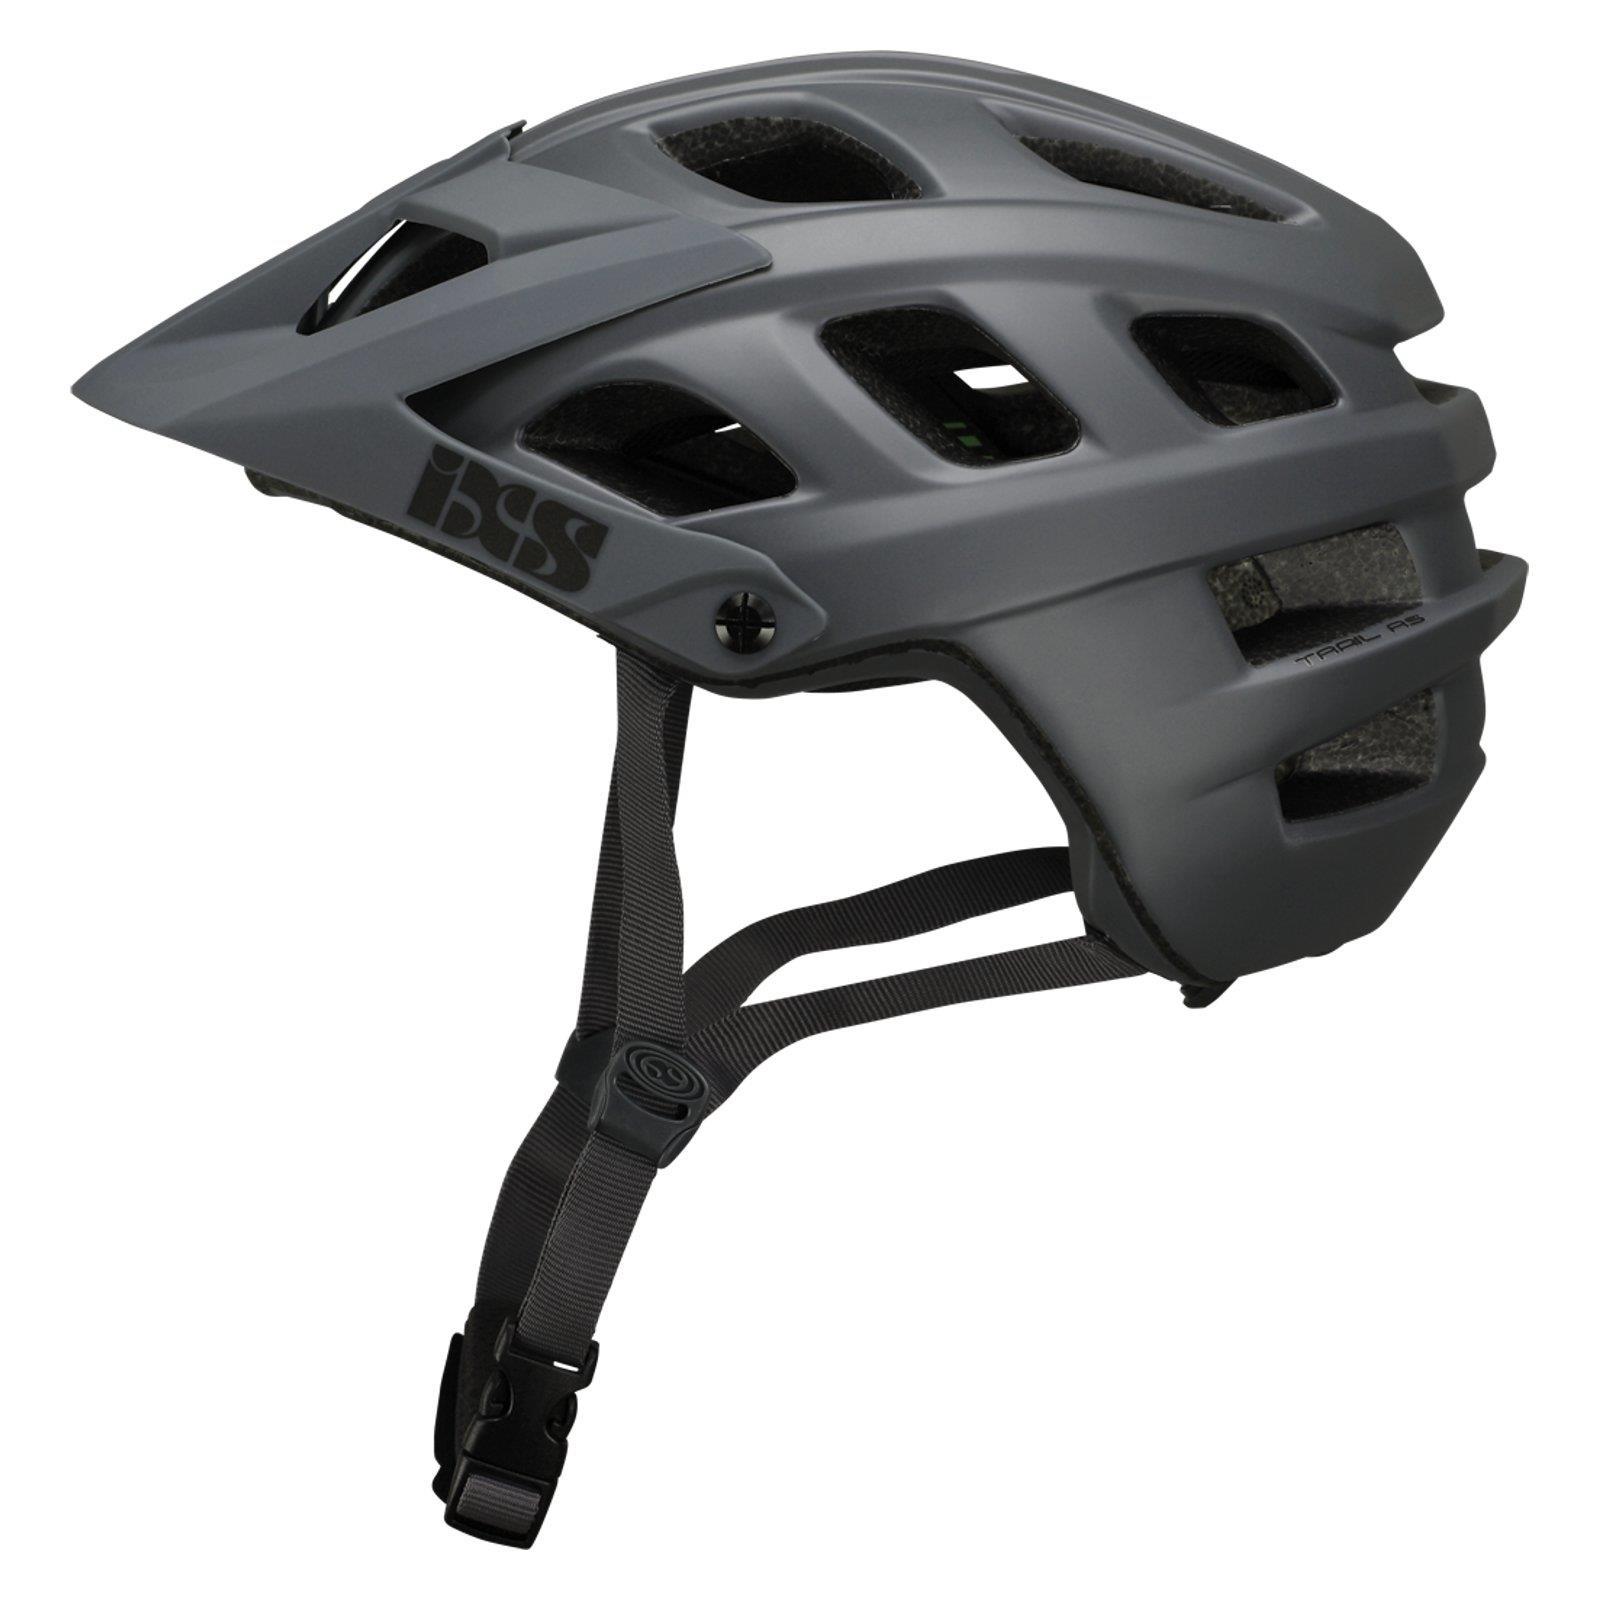 IXS Trail RS evo bicicleta casco All enduro mountain bike, el mtb enduro All DH downhill inmold 31dbd7